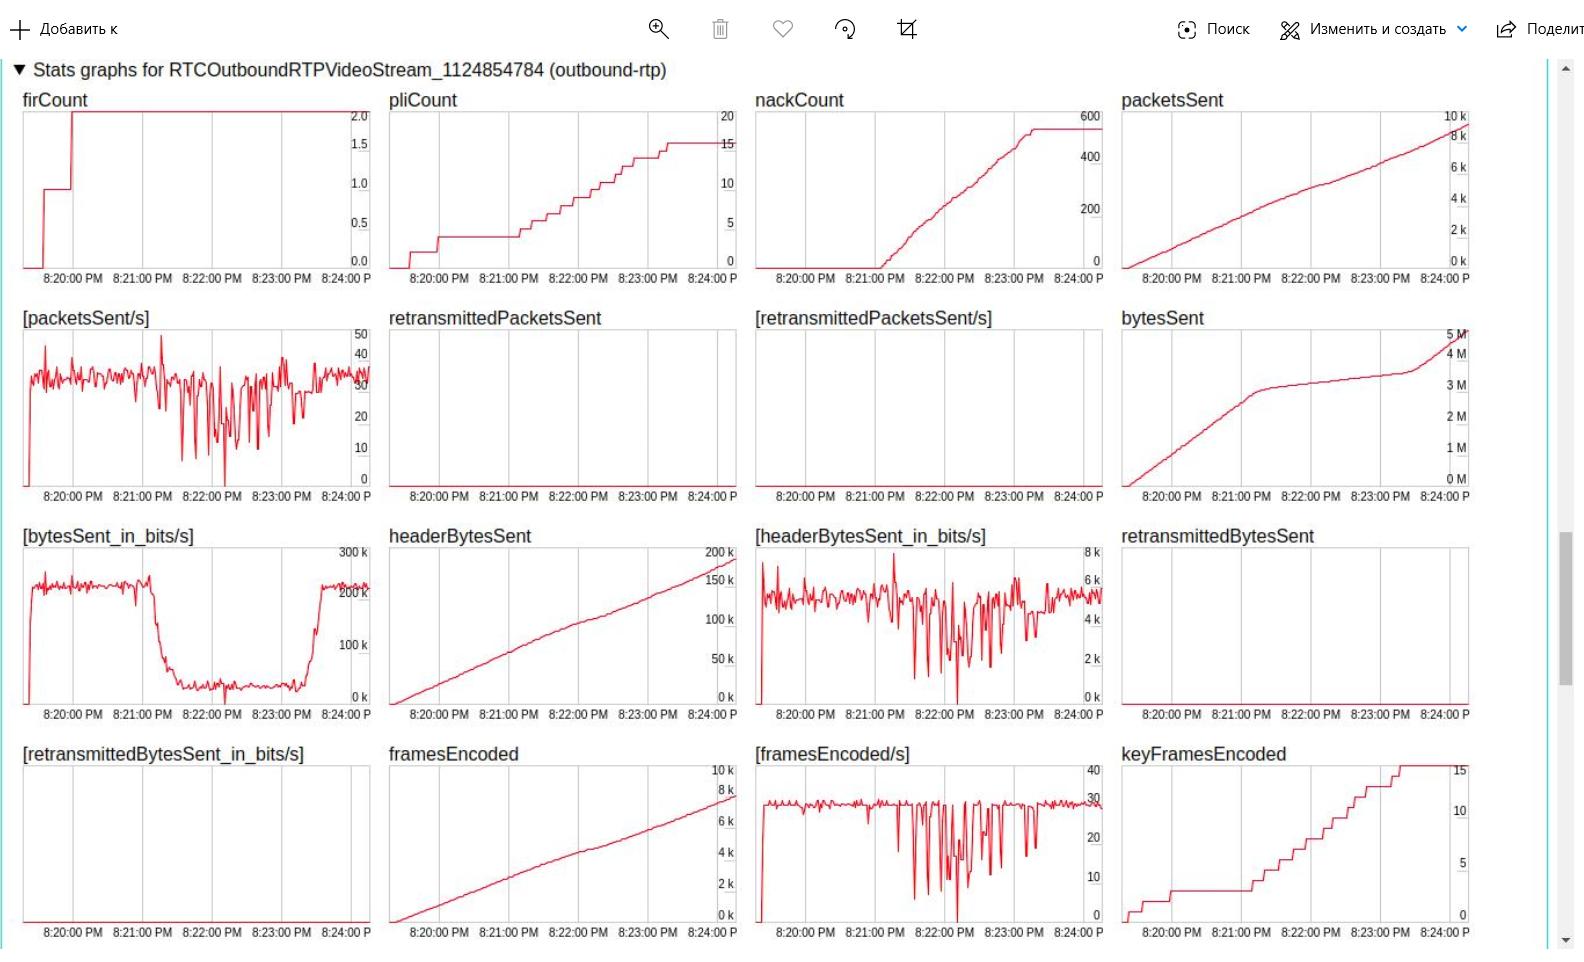 А когда WebRTC снижал трафик на пробном уроке, конверсия снижалась на 10%.